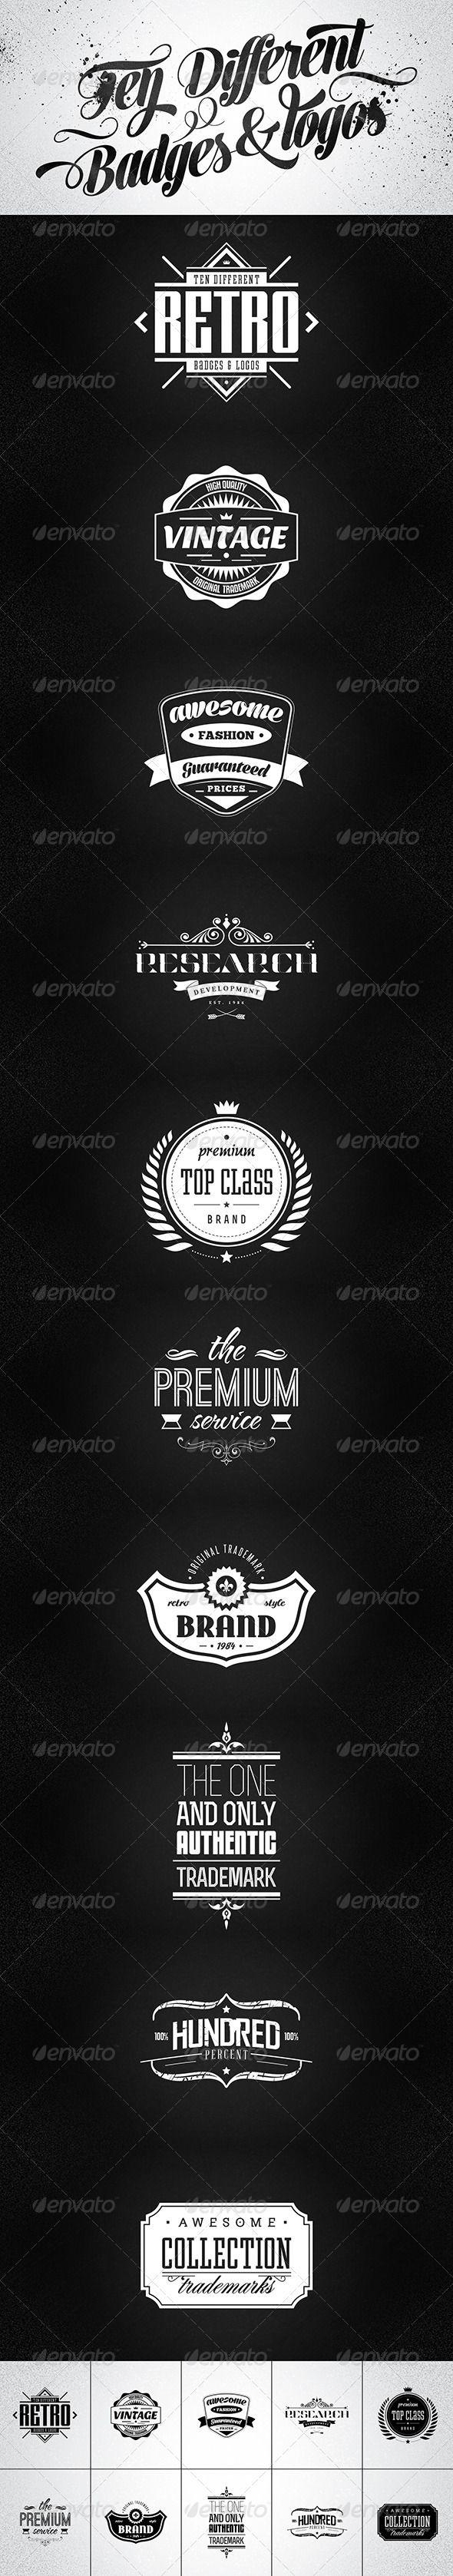 Shirt jack design template - 10 Retro Badges Logos Vol 2